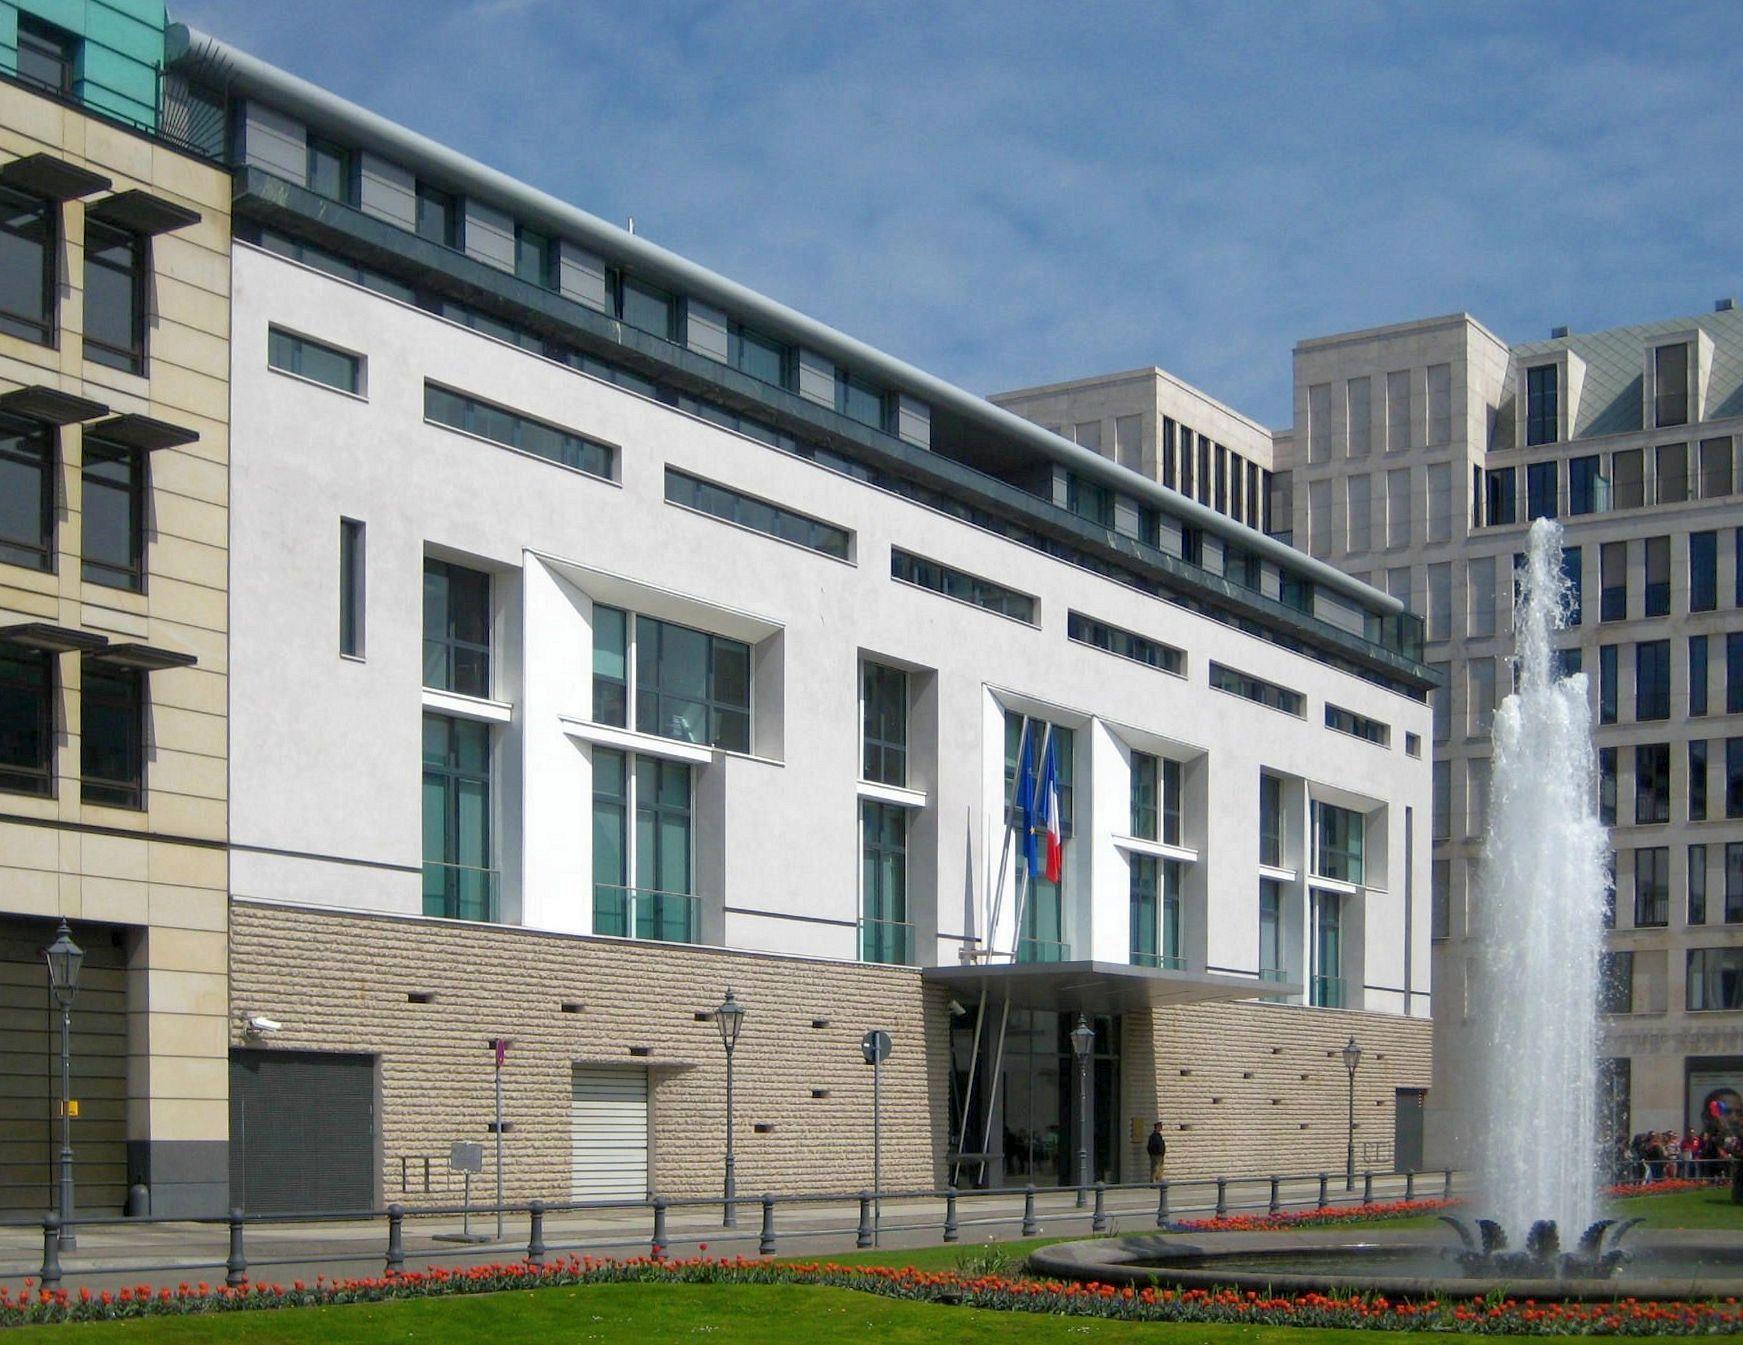 ambassade-pariser-platz